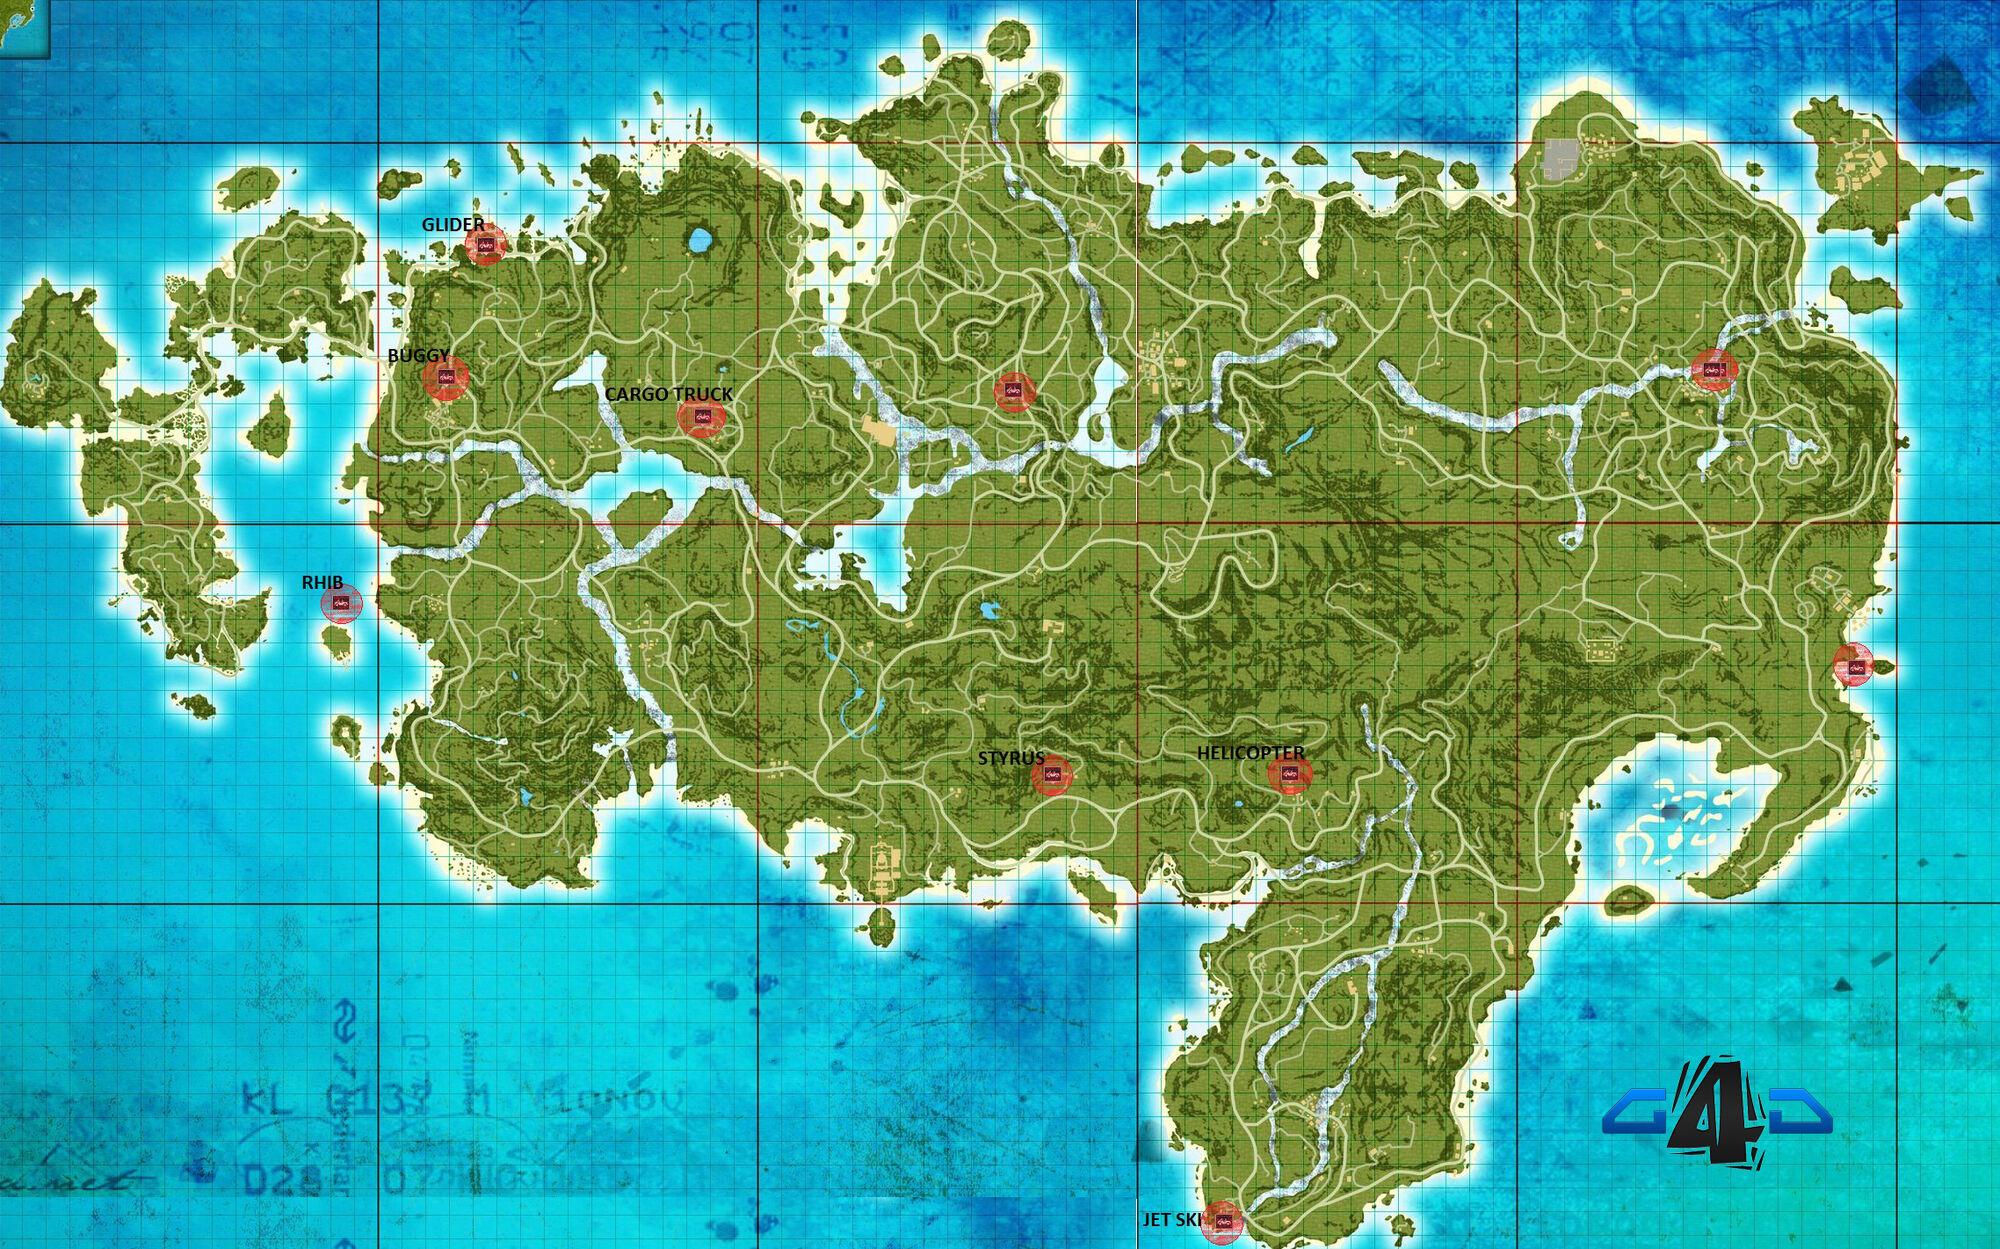 Image FarcryvehicleslocationmapGuideGameScomjpg Far - World map 3